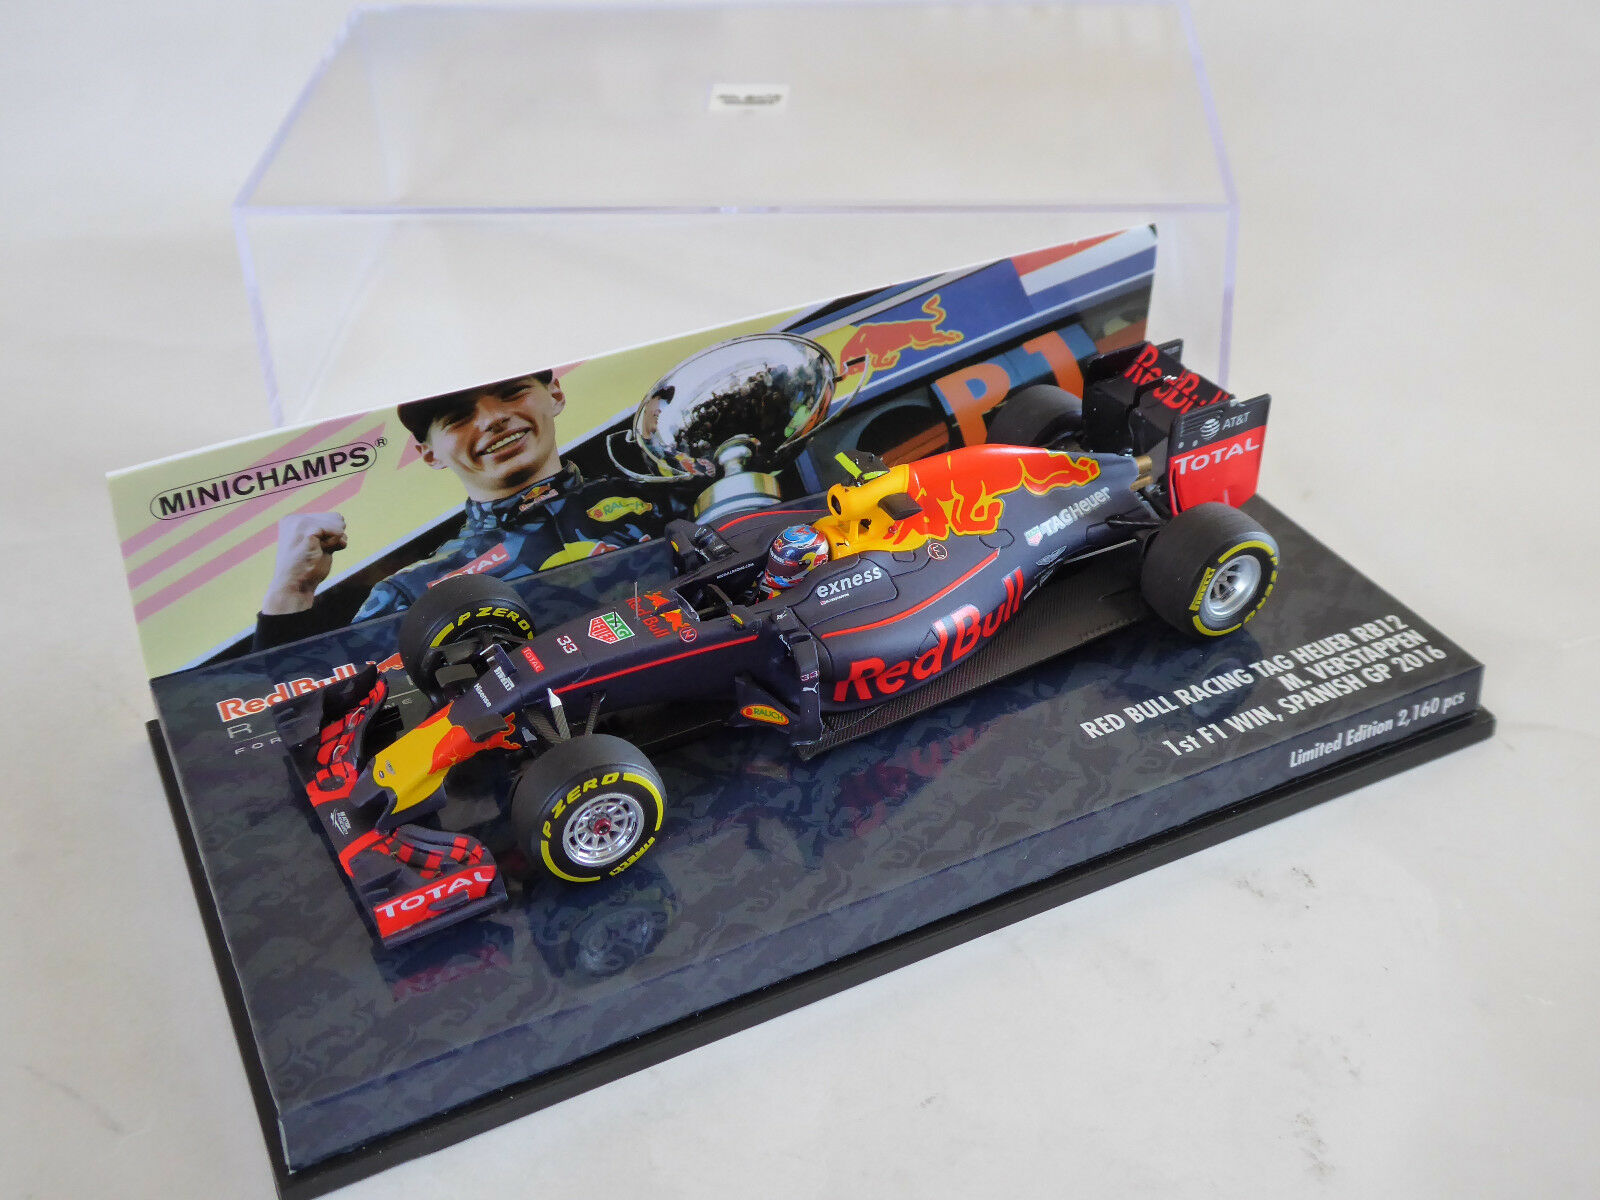 MINICHAMPS 1 43 rouge BULL rb12 Tag Heuer RENAULT Verstappen 1st Win 2016 Espagne